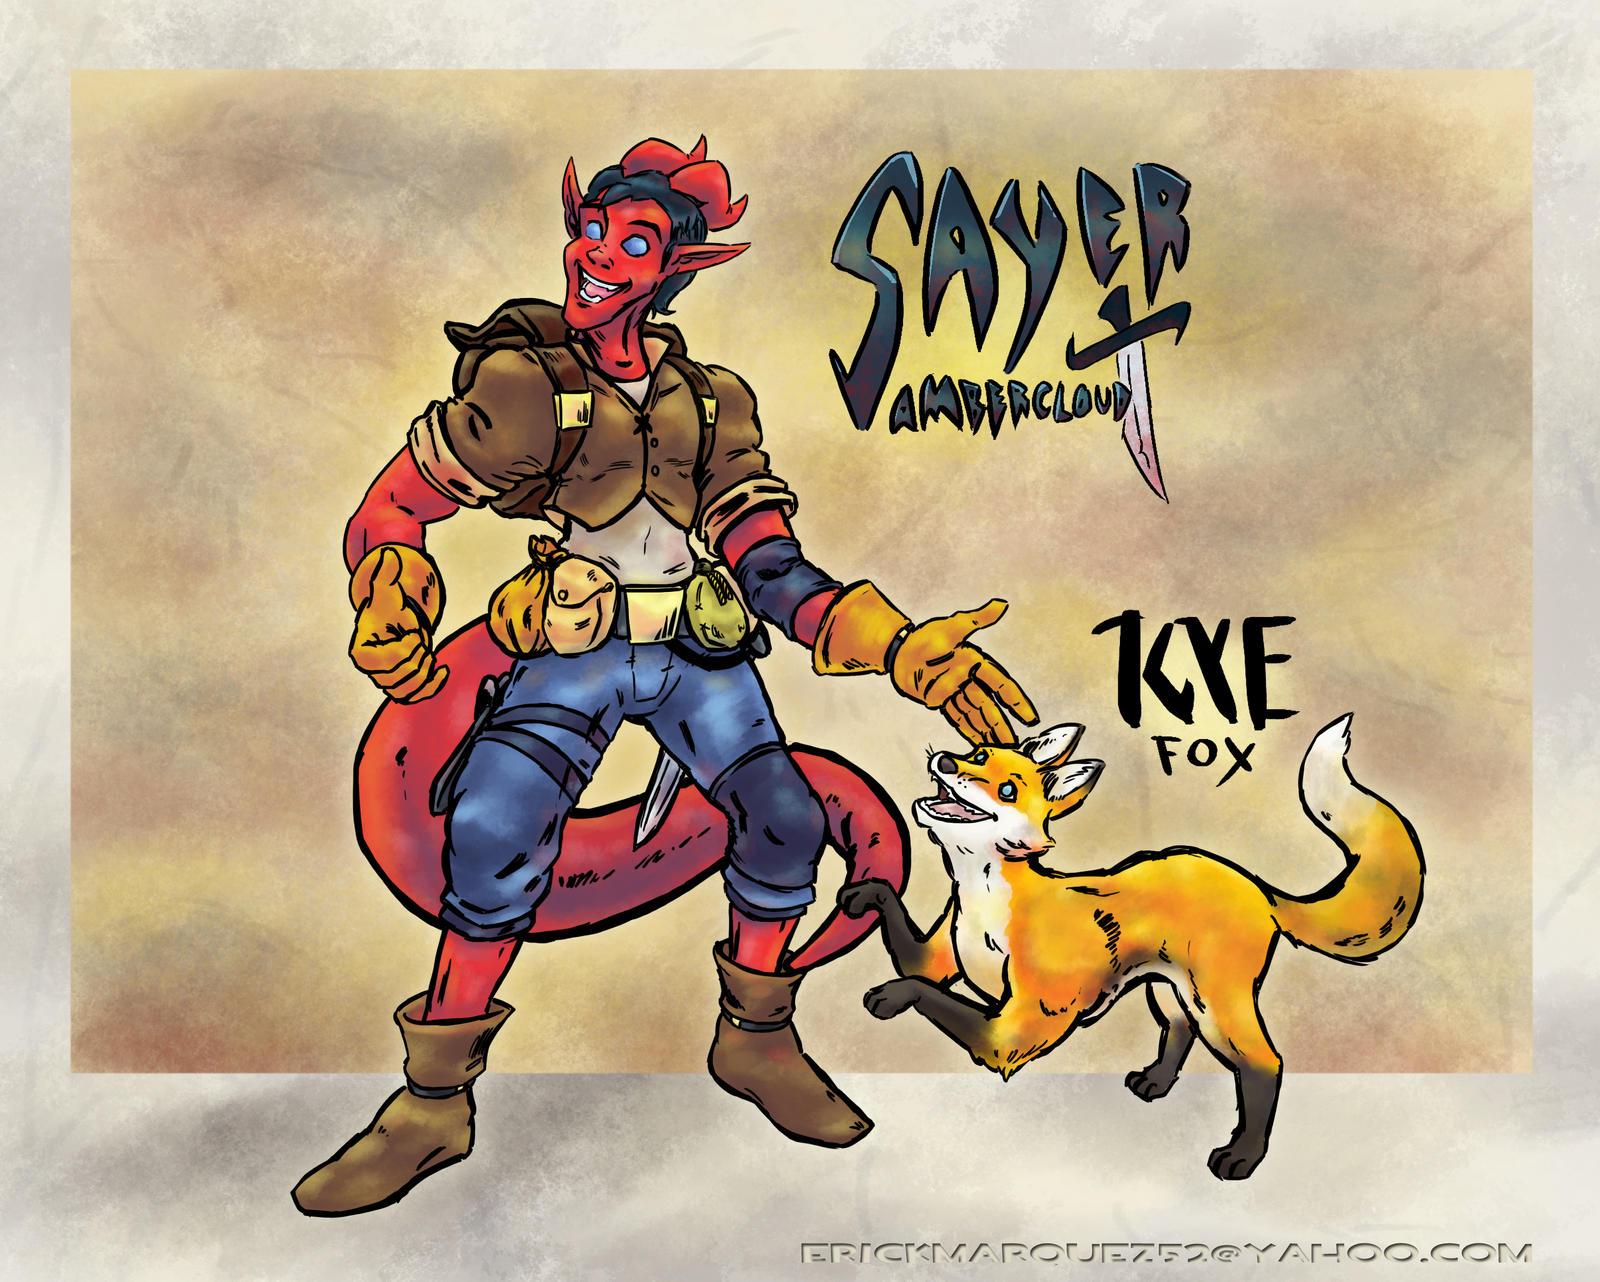 Sayer Ambercloud and Kye Fox by TheInsaneDingo